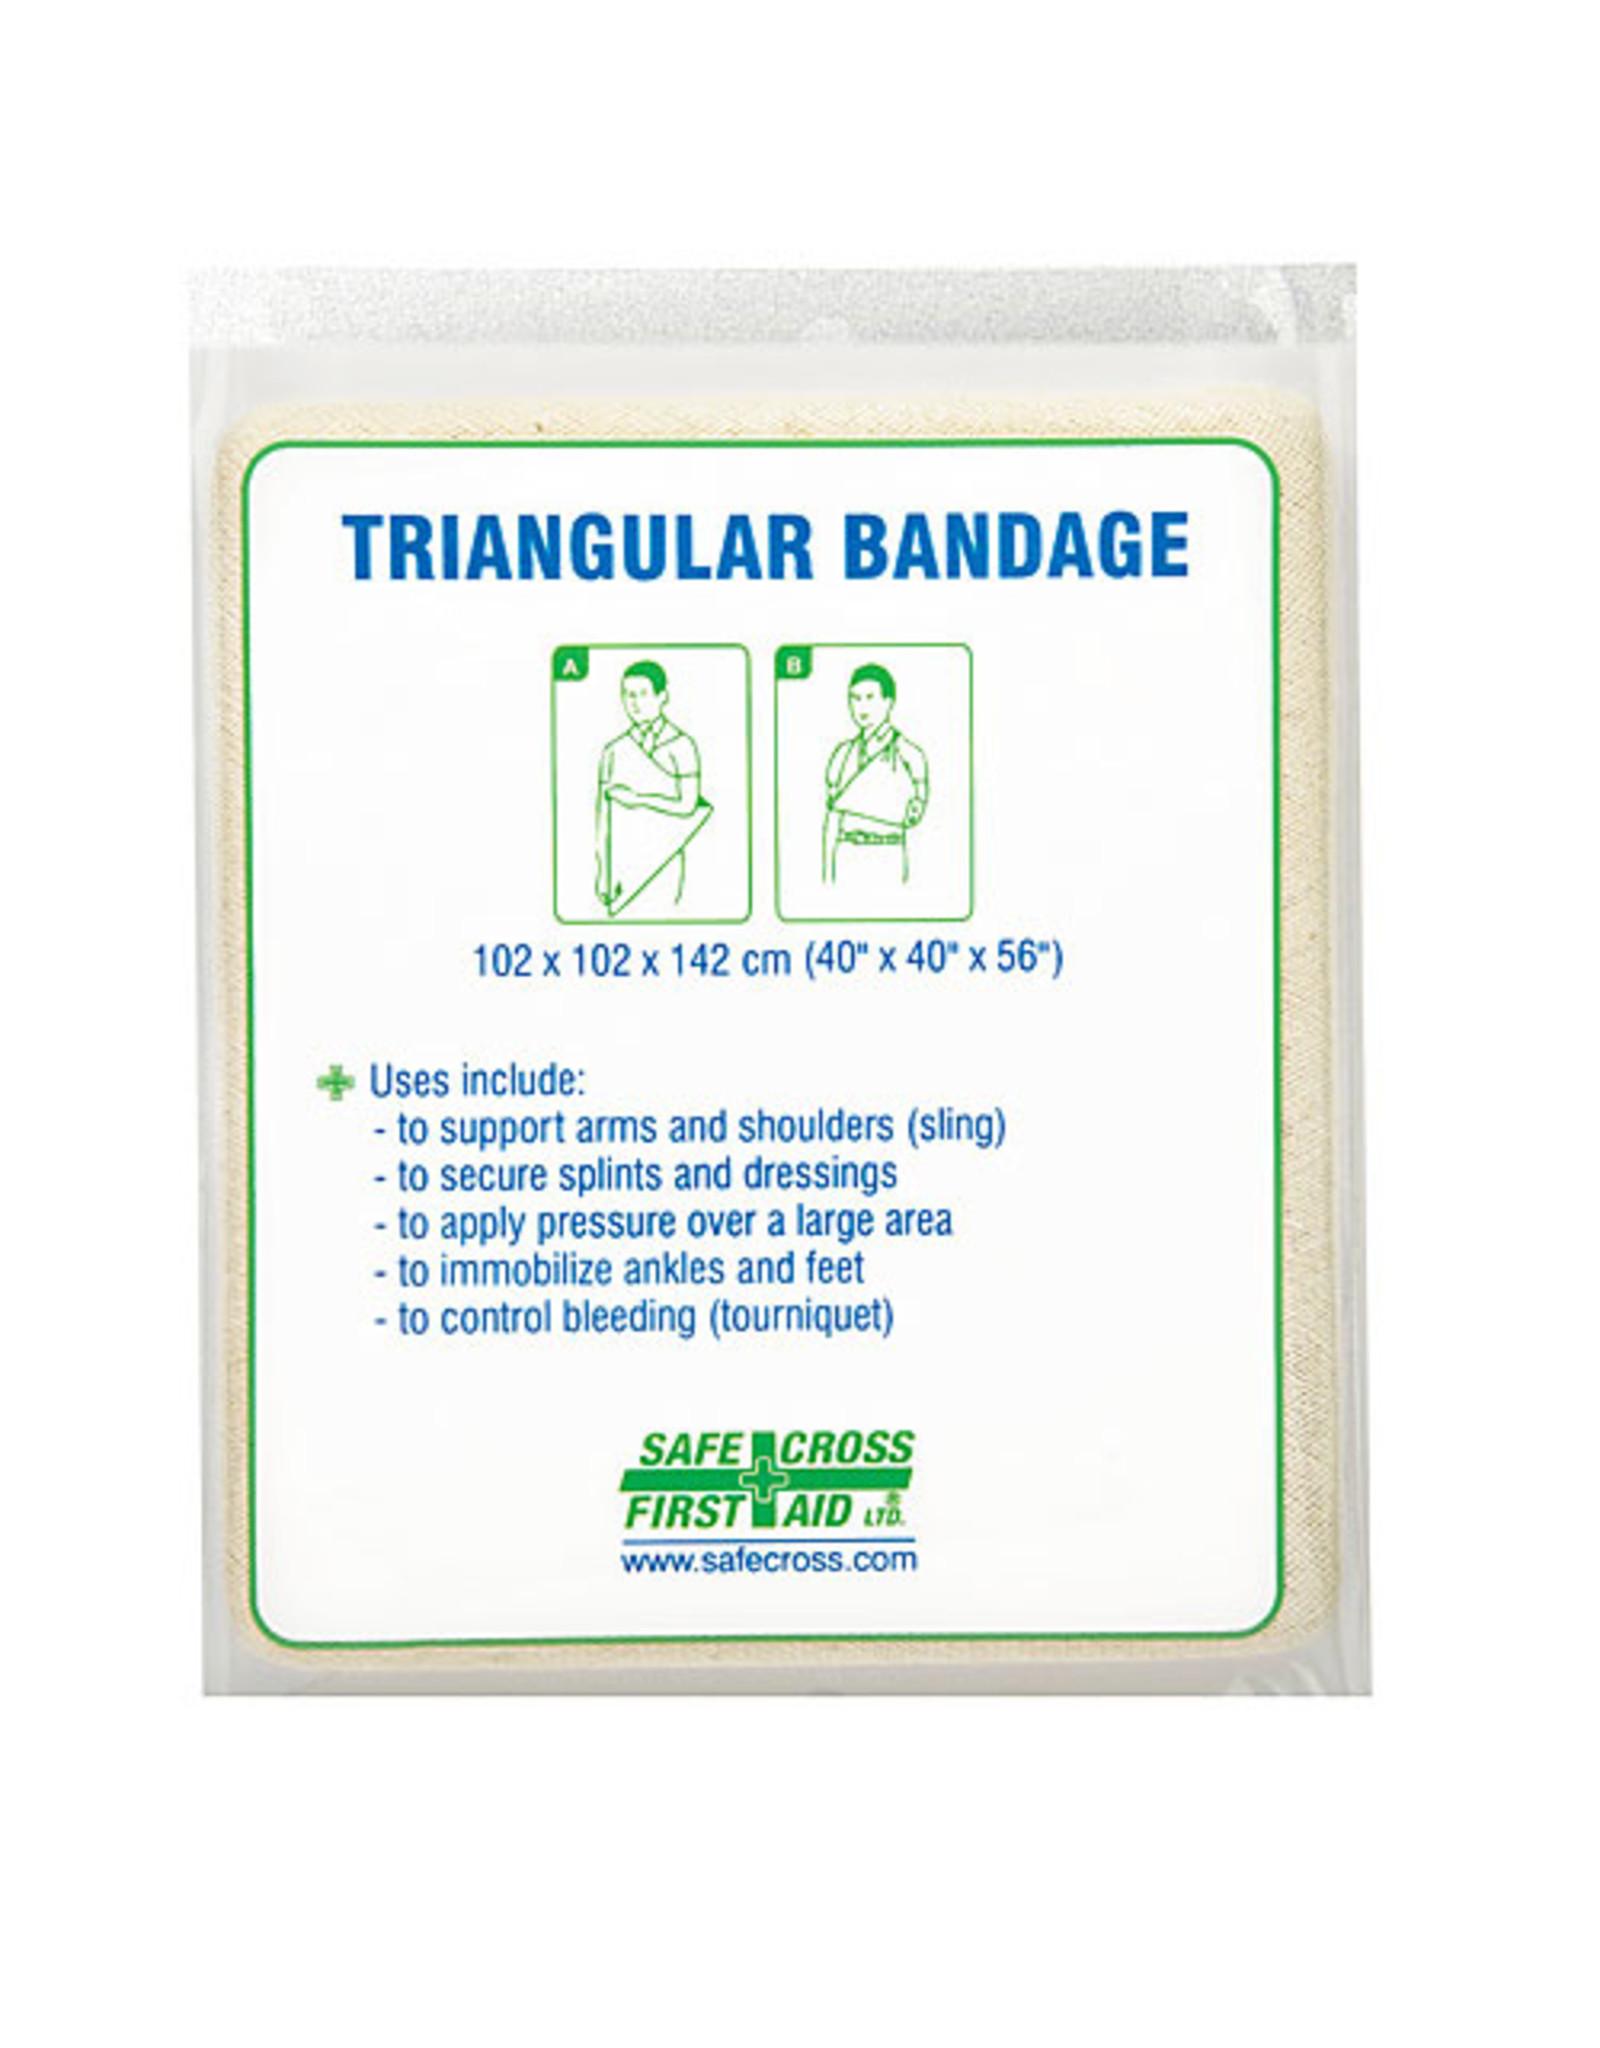 "Triangular Bandage, 101.6 x 101.6 x 142.2 cm, (40"" x 40"" x 56"") Non-Compressed"